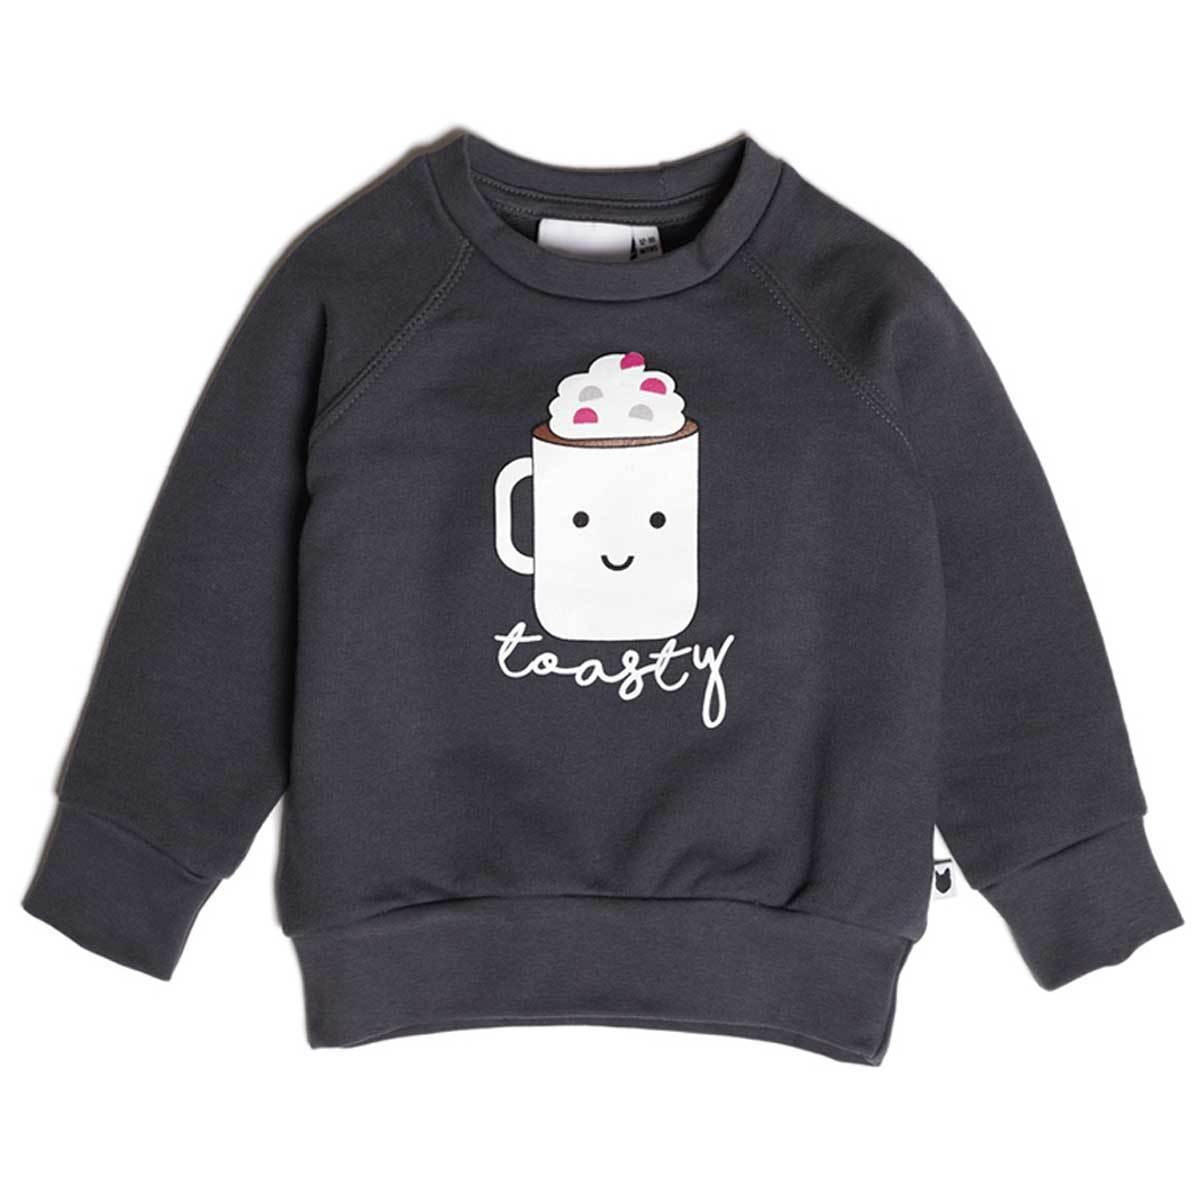 Hauts bébé Sweatshirt Toasty Loopback 6/12 mois Sweatshirt Toasty Loopback 6/12 mois